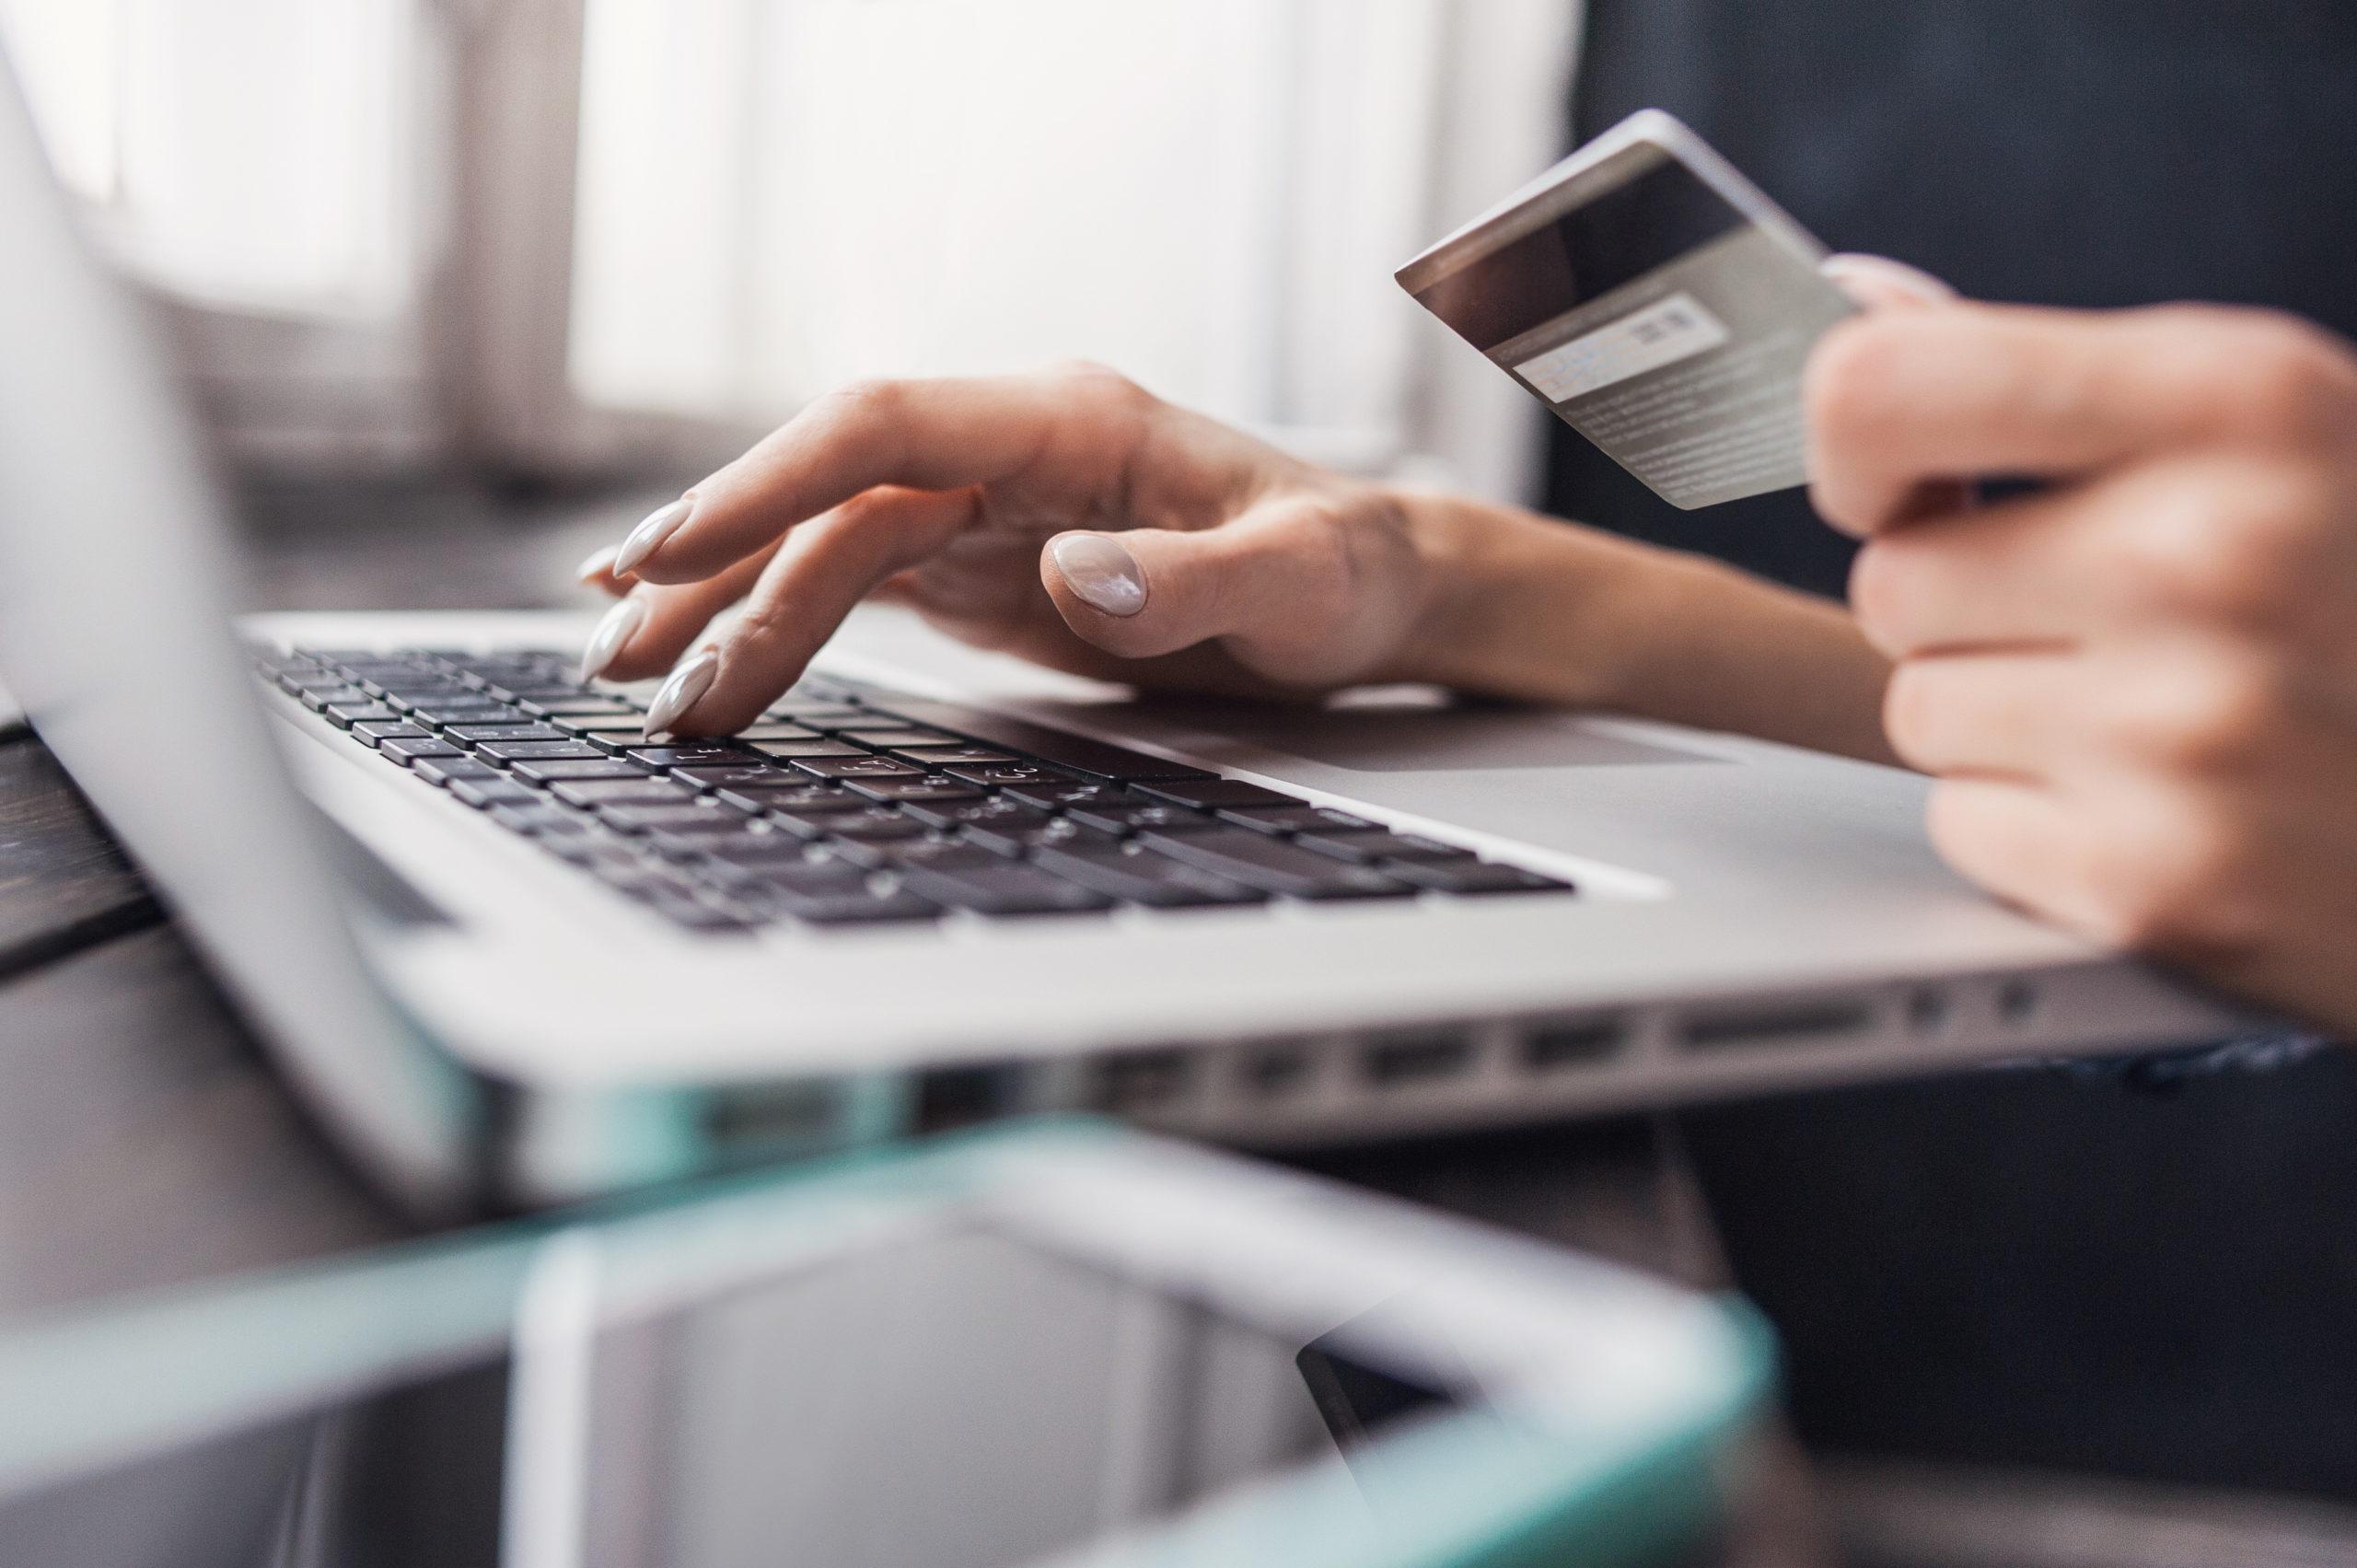 online shopping holidays